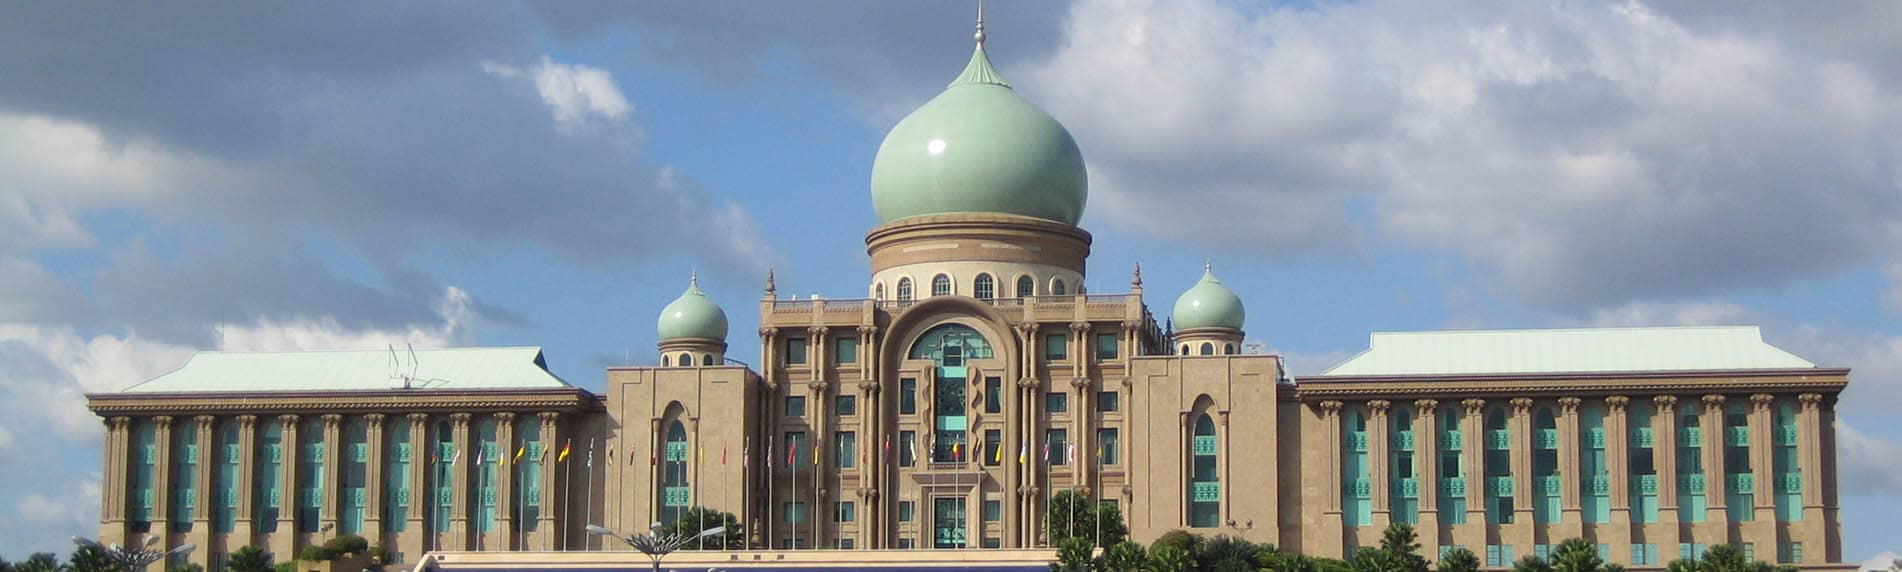 Putrajaya and Agricultural Heritage Park